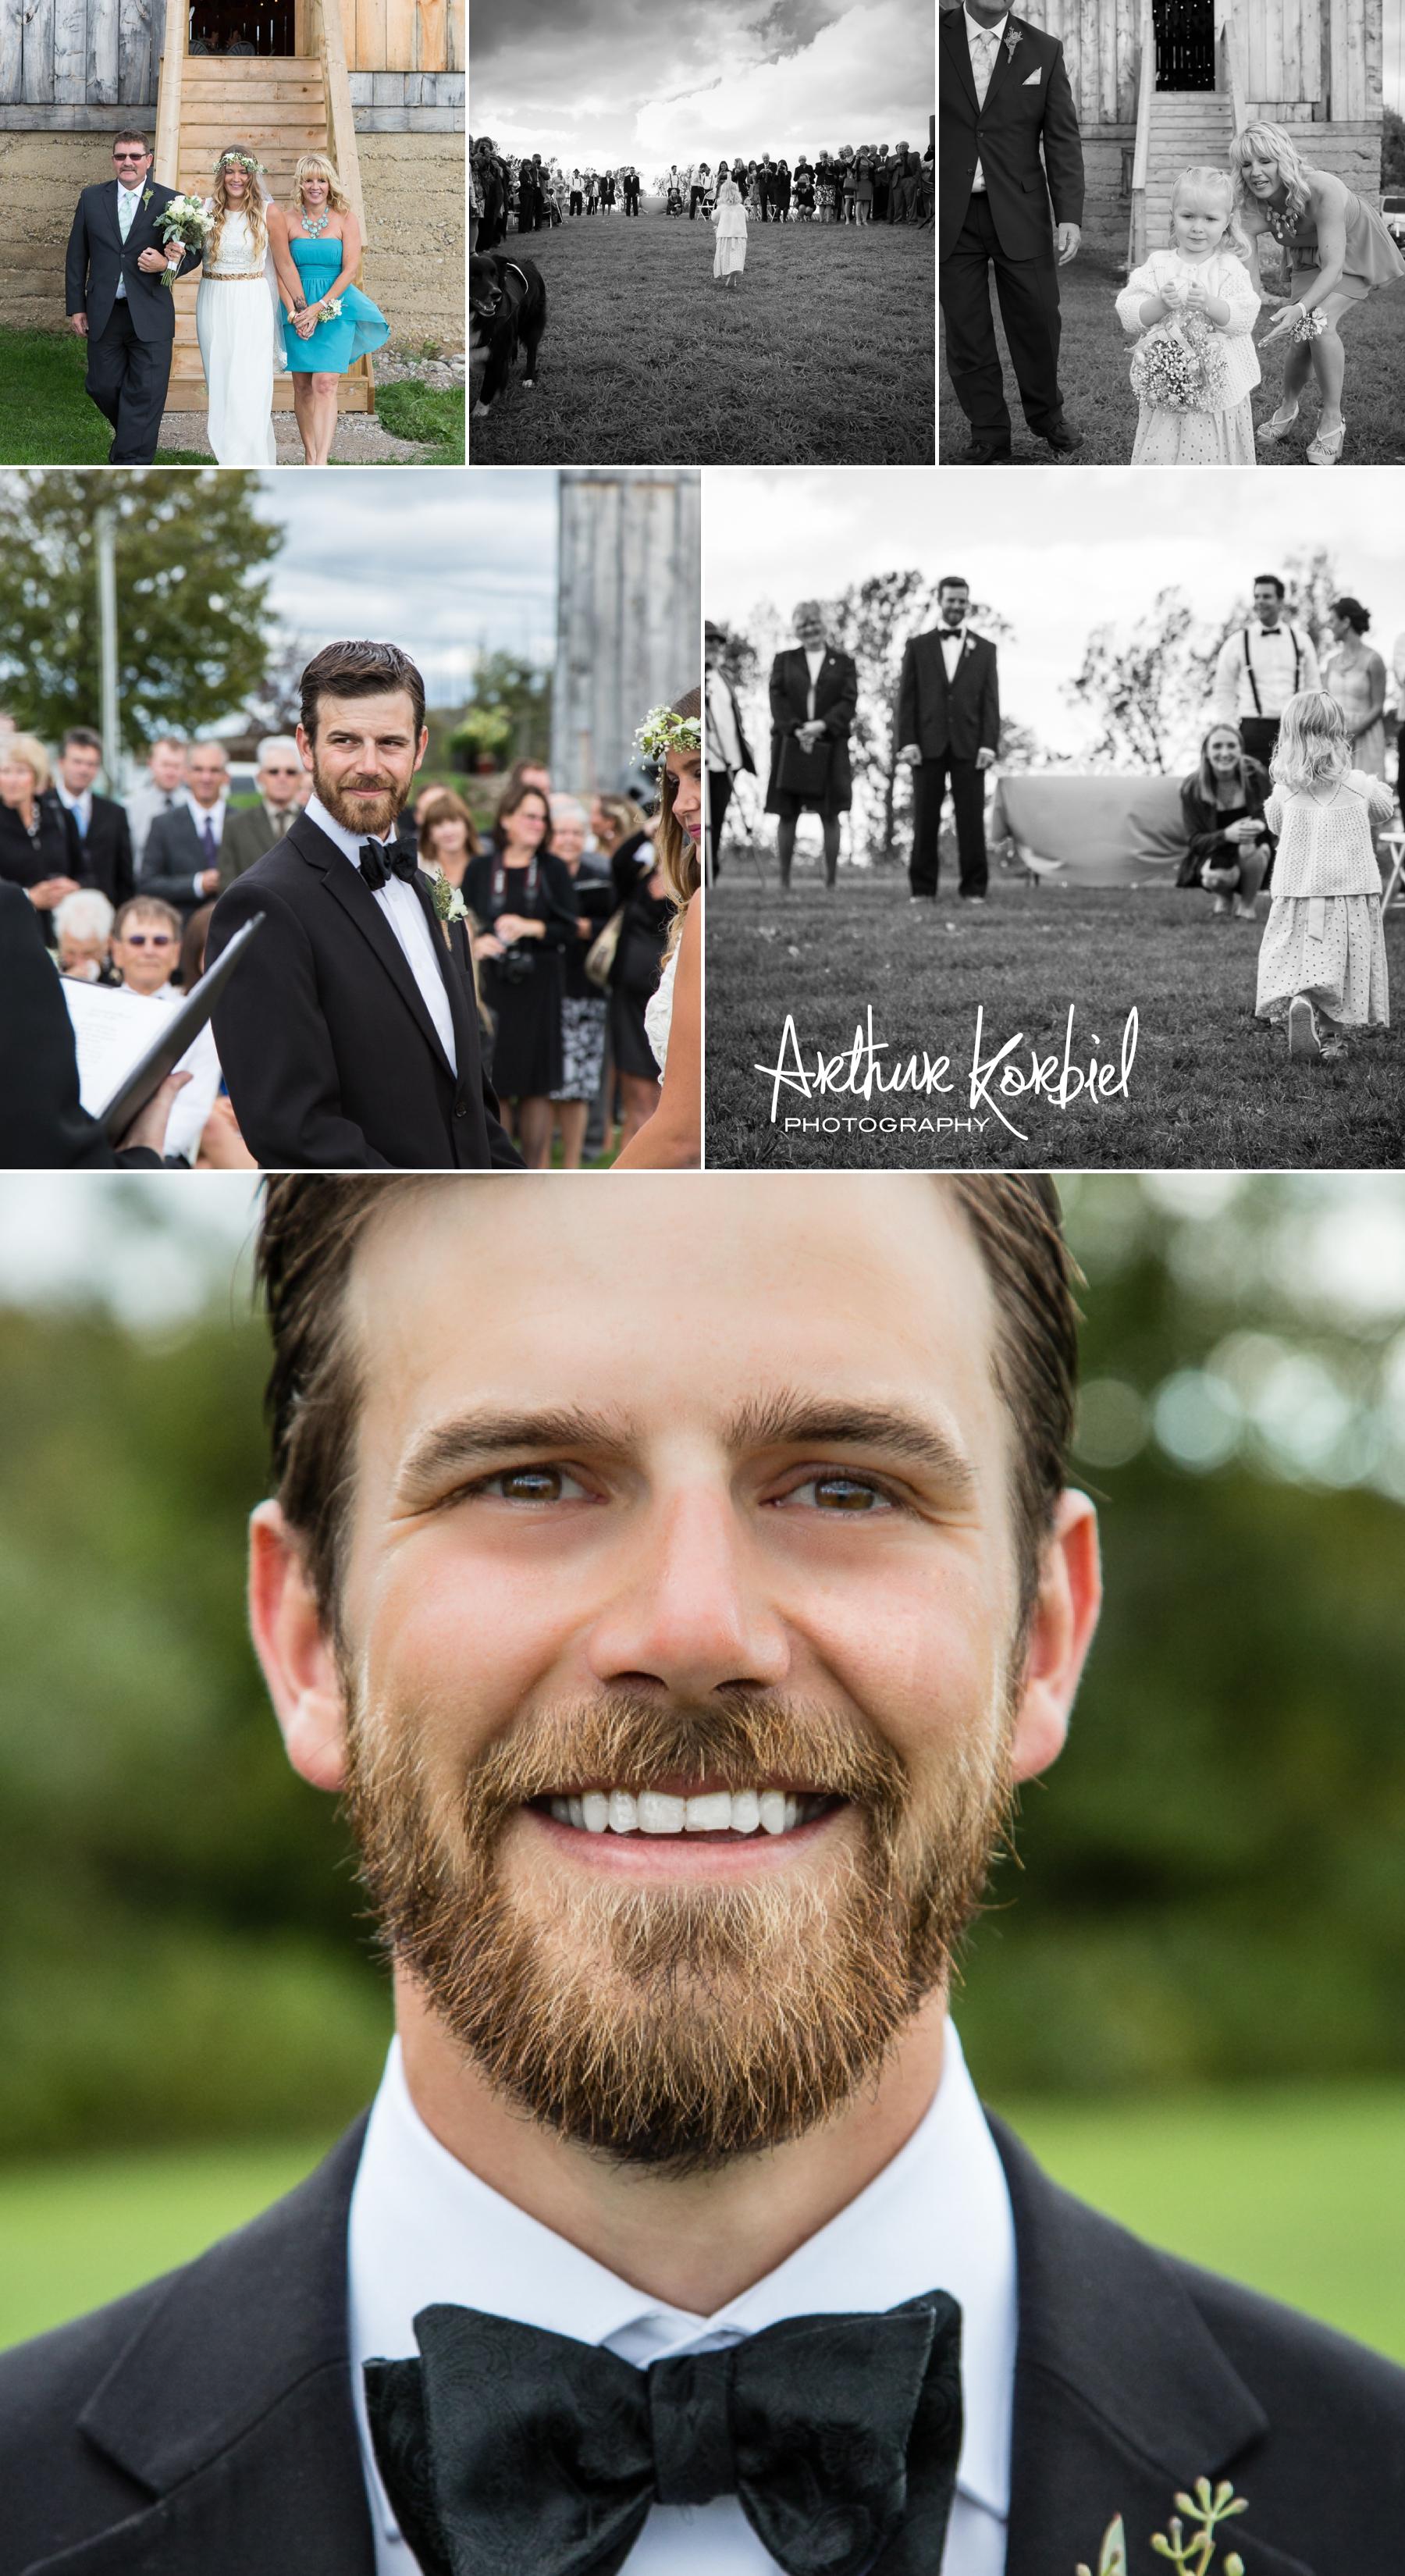 Arthur Korbiel Photography - London Engagement Photographer - Sauble Beach Barn Wedding - Samantha & Dan_005.jpg